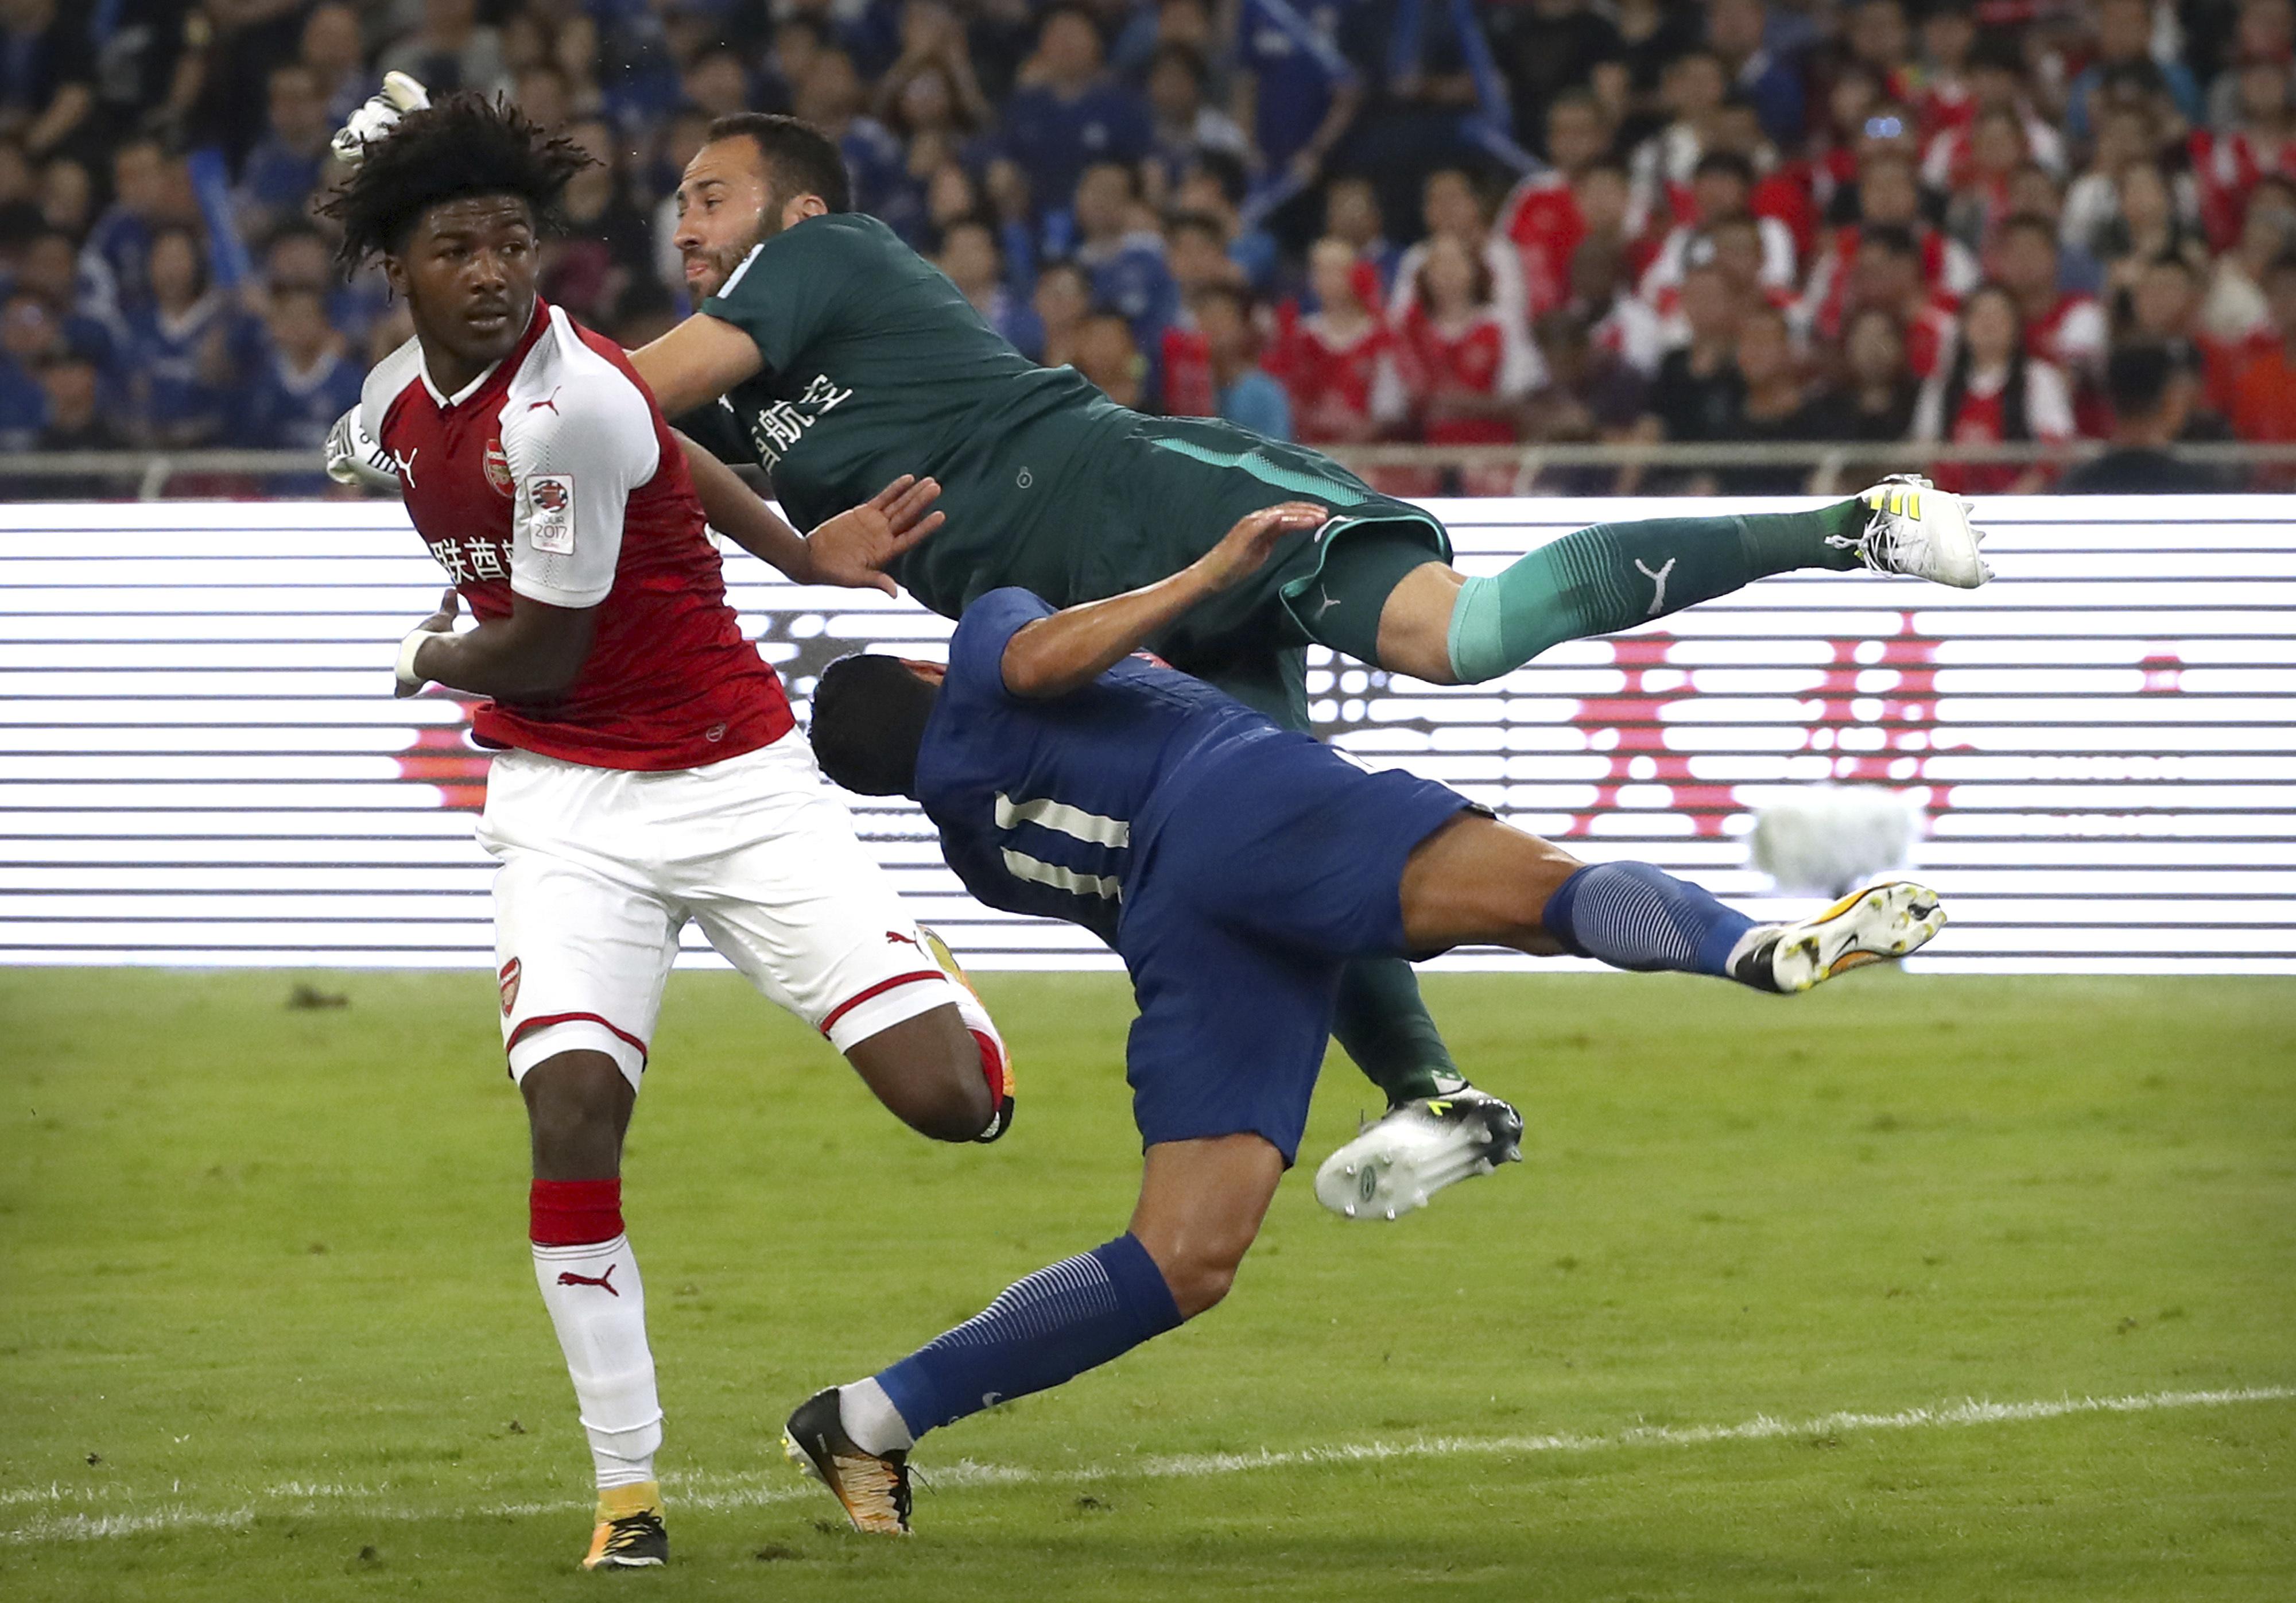 Al detalle: Así fue el golpe que le causó fracturas múltiples a Pedro en Chelsea-Arsenal